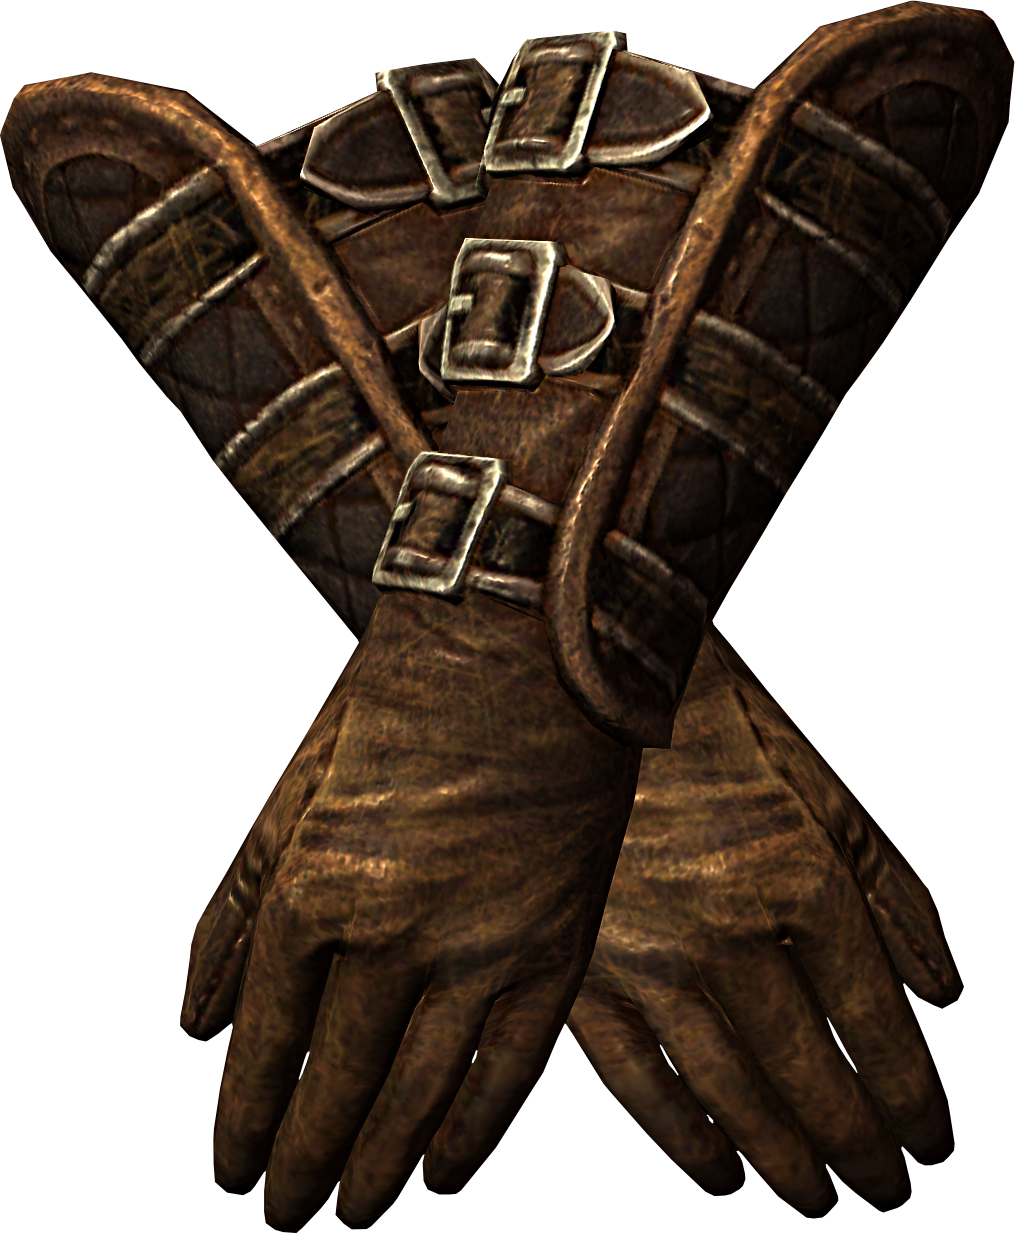 Black leather gloves skyrim - Black Leather Gloves Skyrim 16